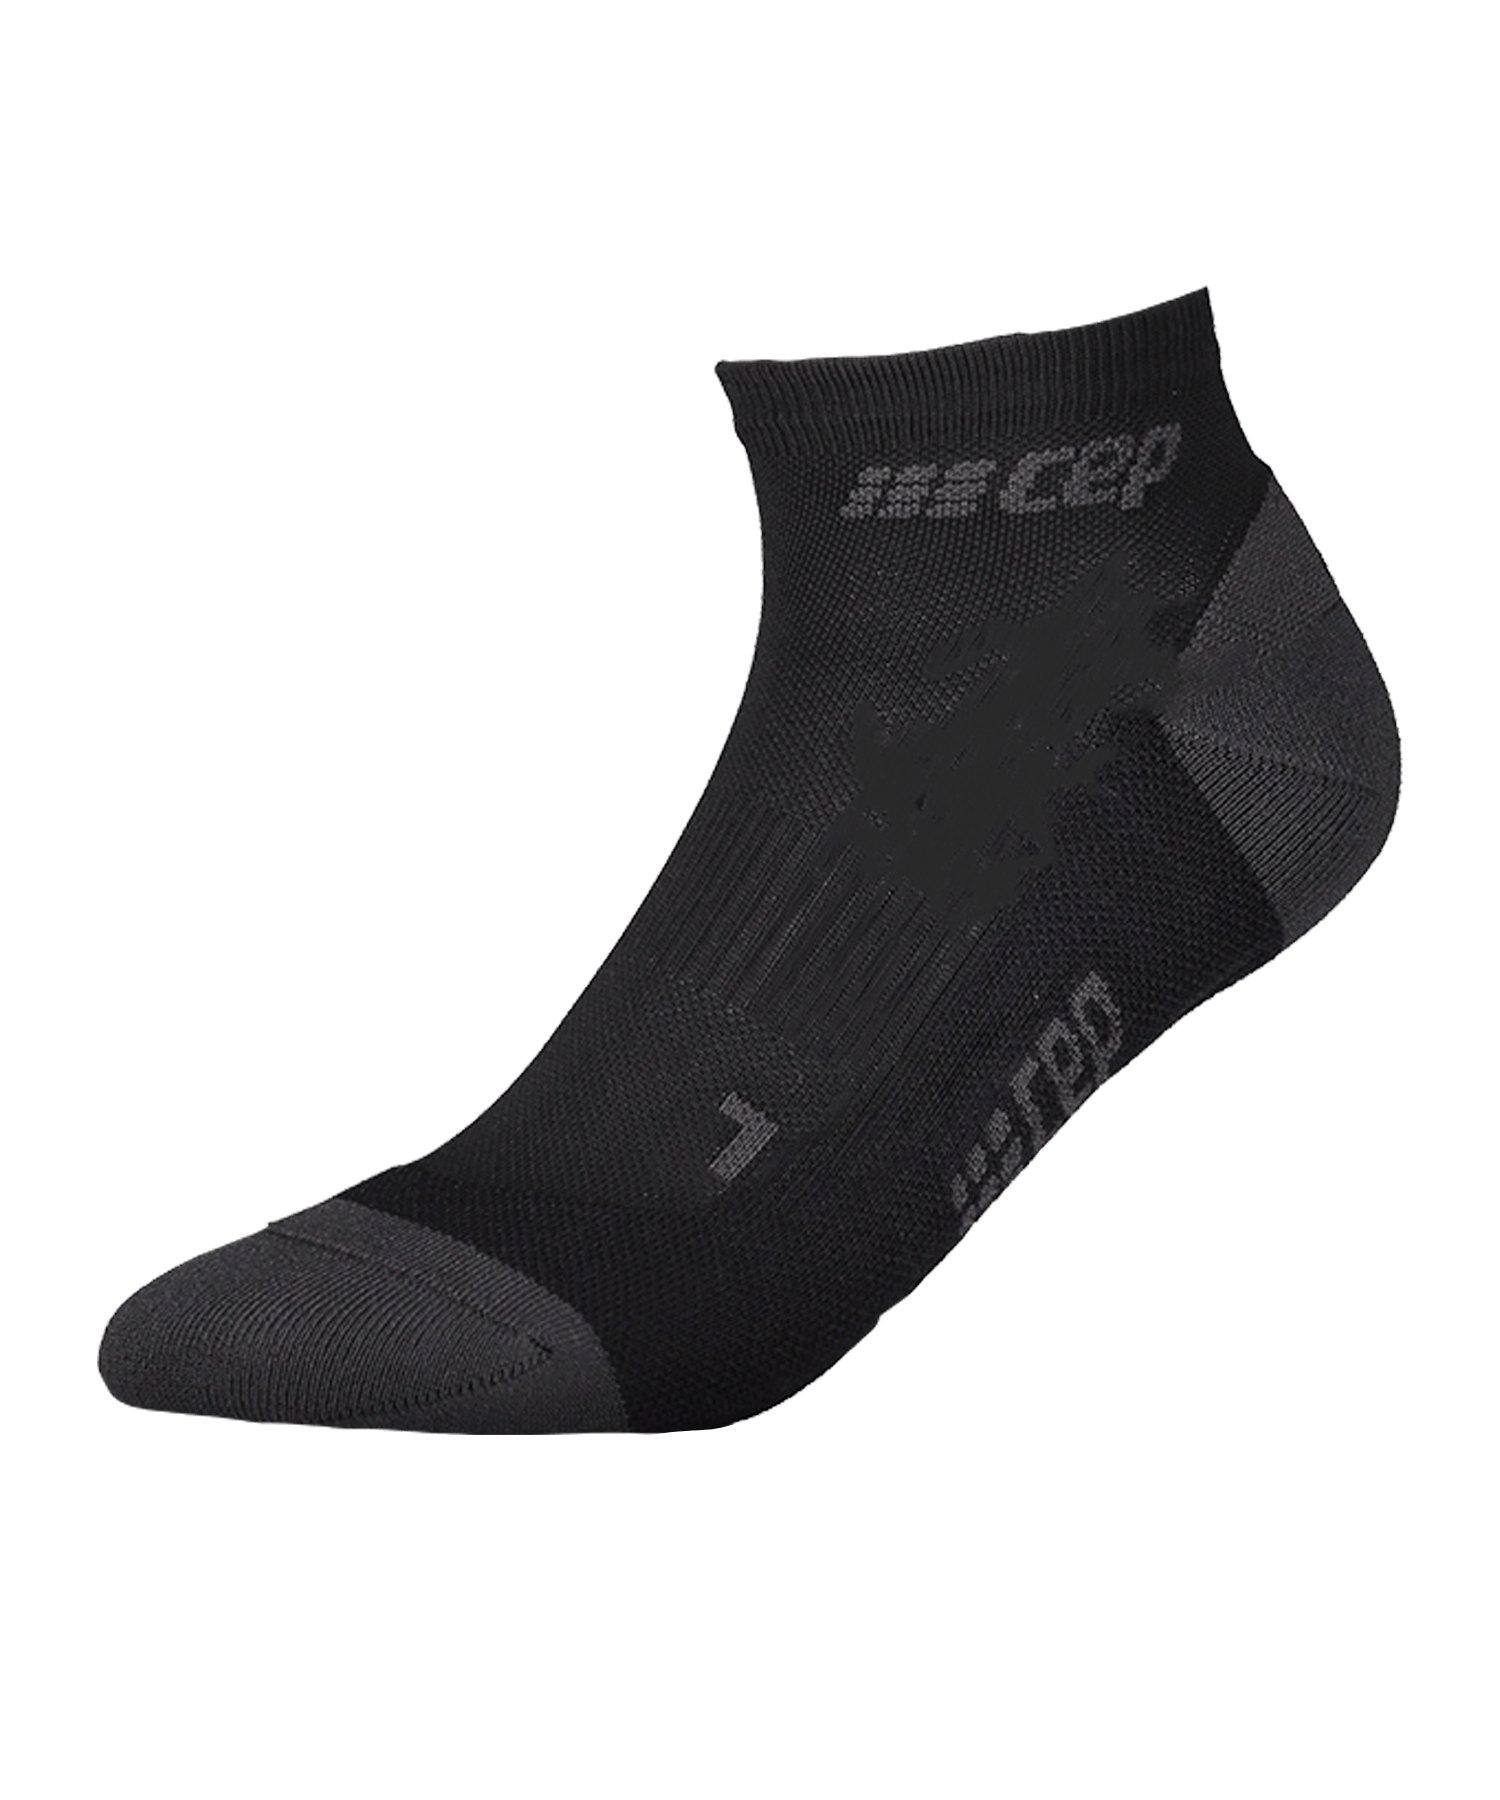 CEP Low Cut Socks 3.0 Socken Running Damen Schwarz - schwarz